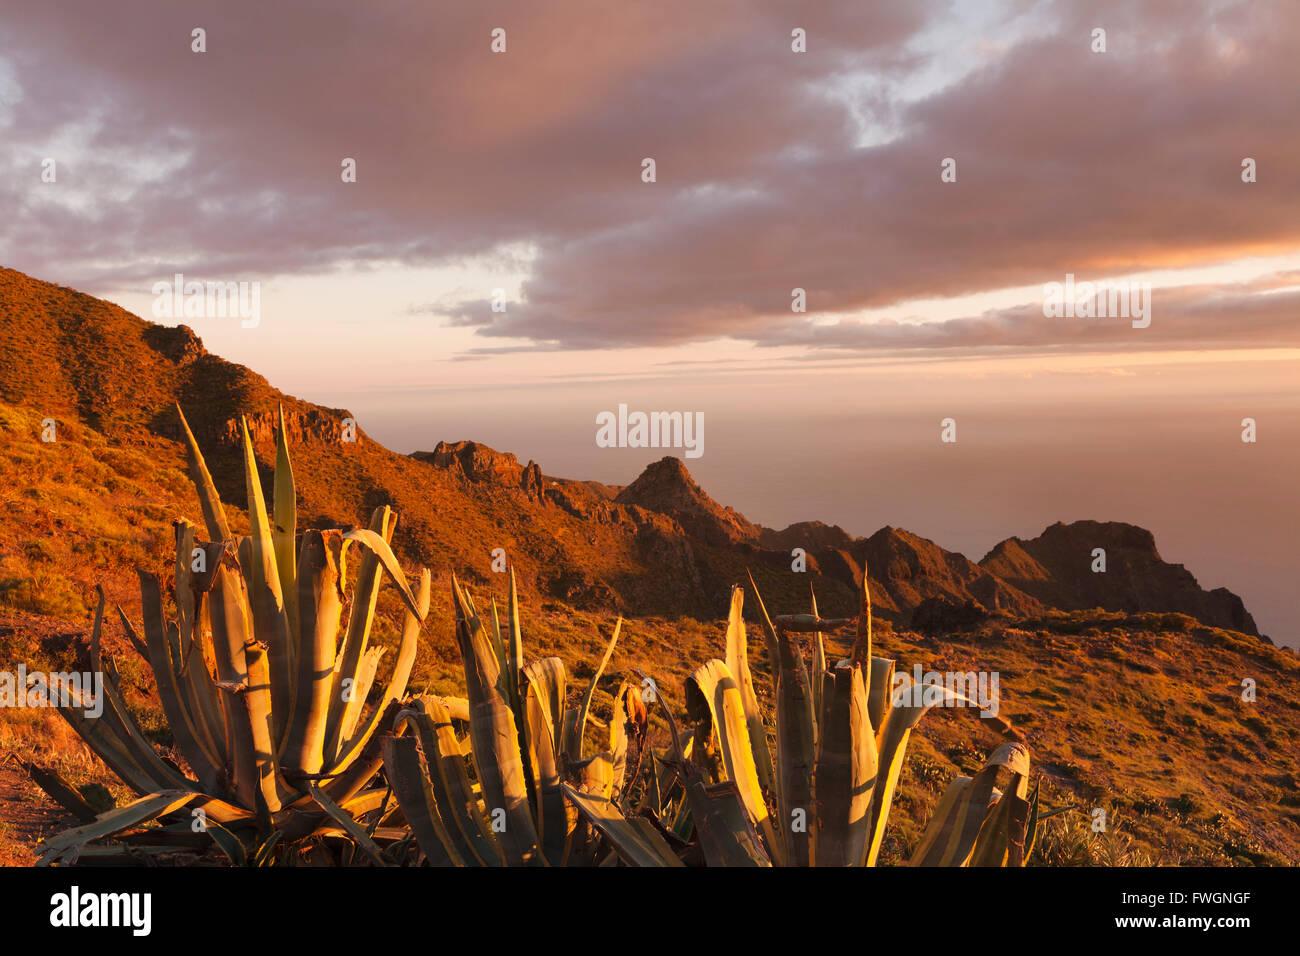 Teno-Gebirge bei Sonnenuntergang, Teneriffa, Kanarische Inseln, Spanien, Europa Stockbild